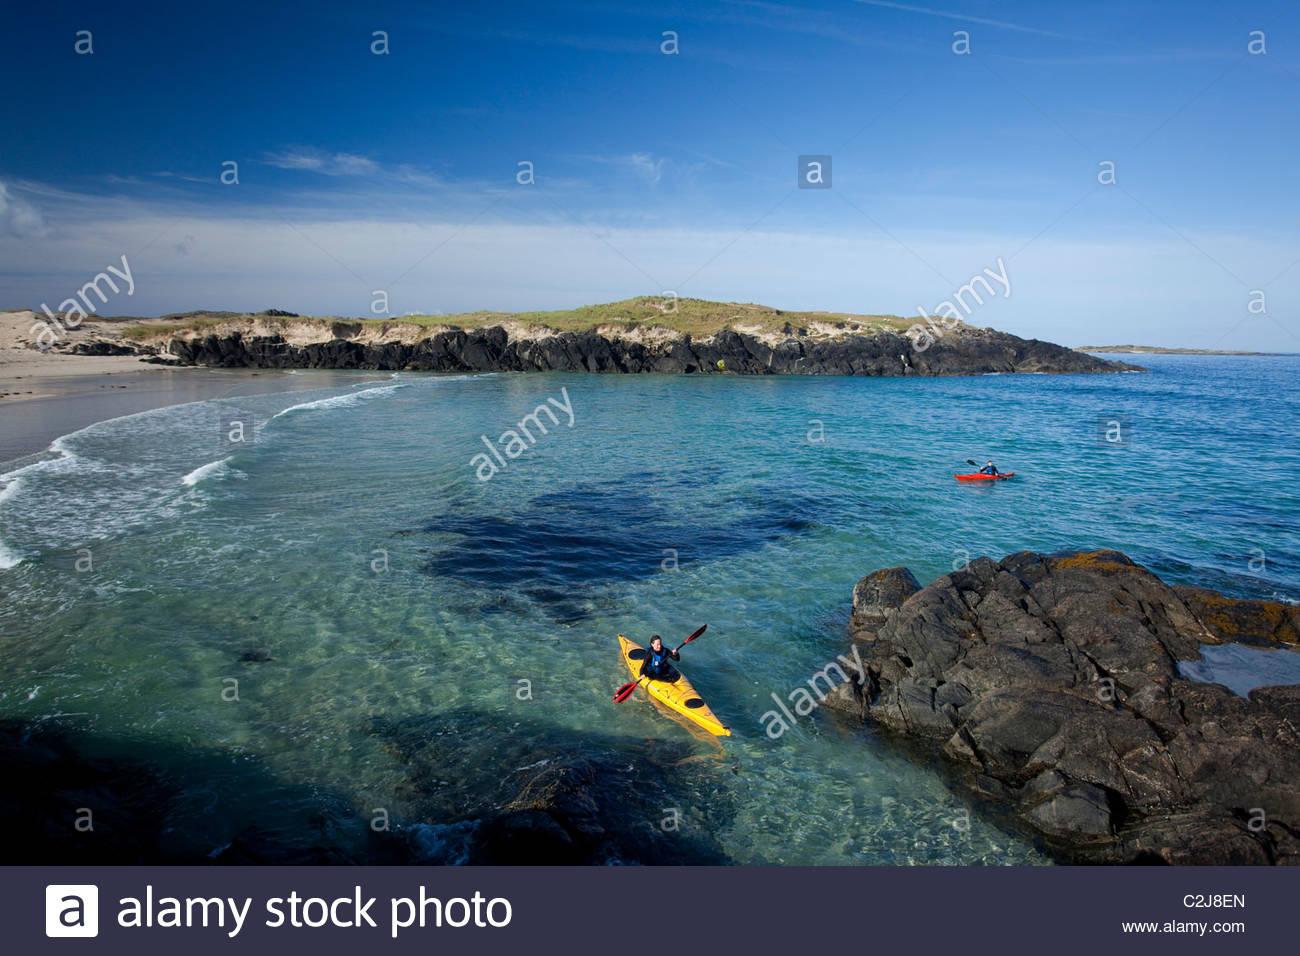 Sea kayaking in False Bay, Mannin Bay, Connemara, County Galway, Ireland. - Stock Image